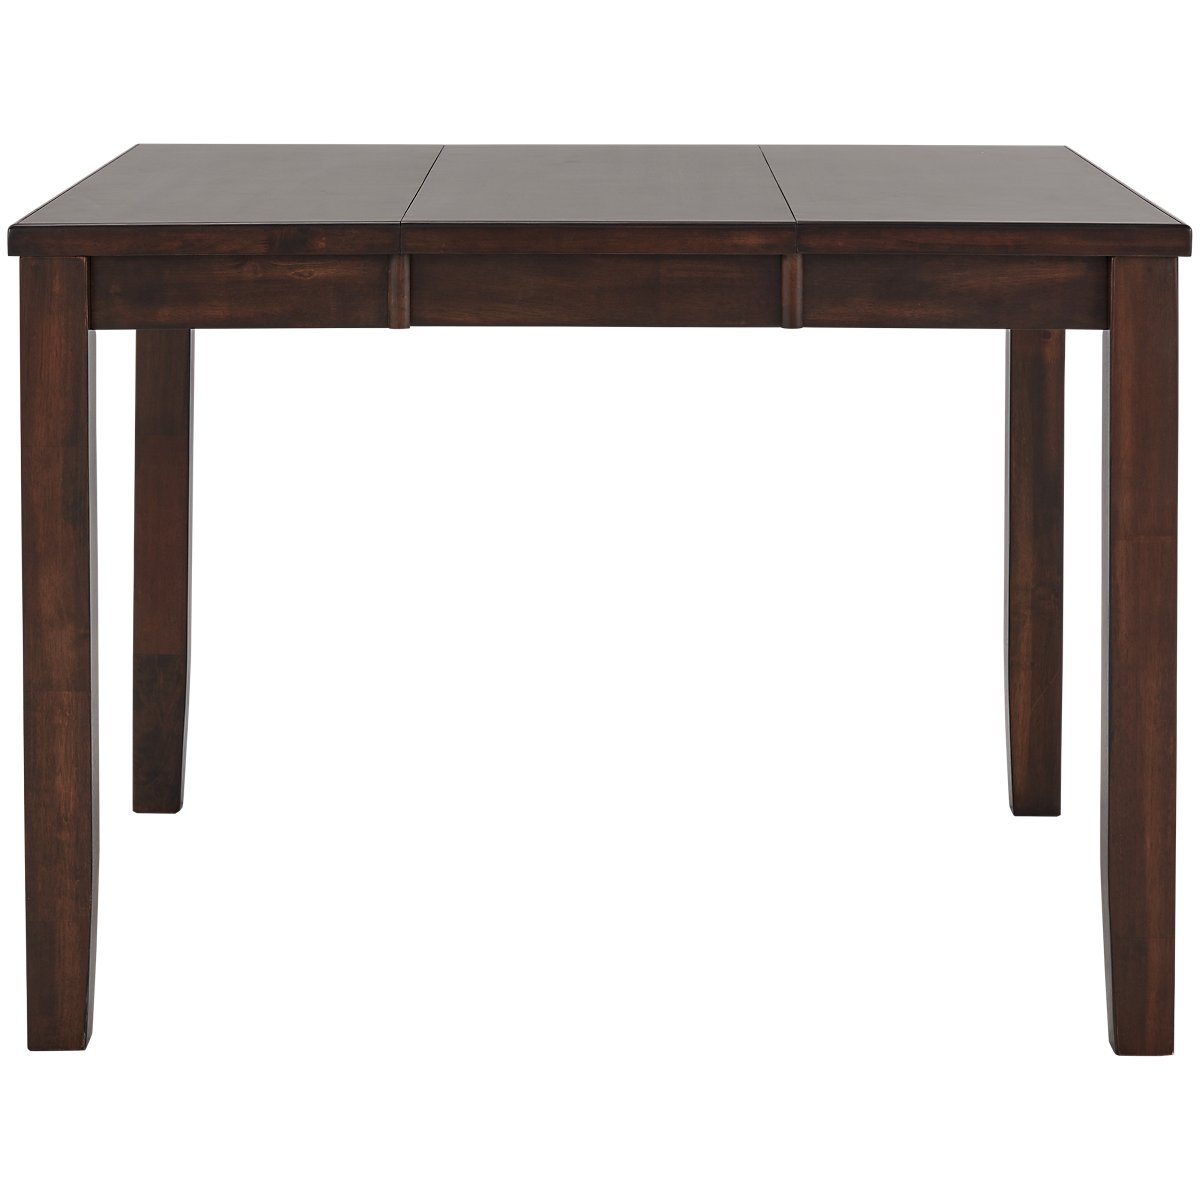 City Furniture Hayden Dark Gray High Dining Table